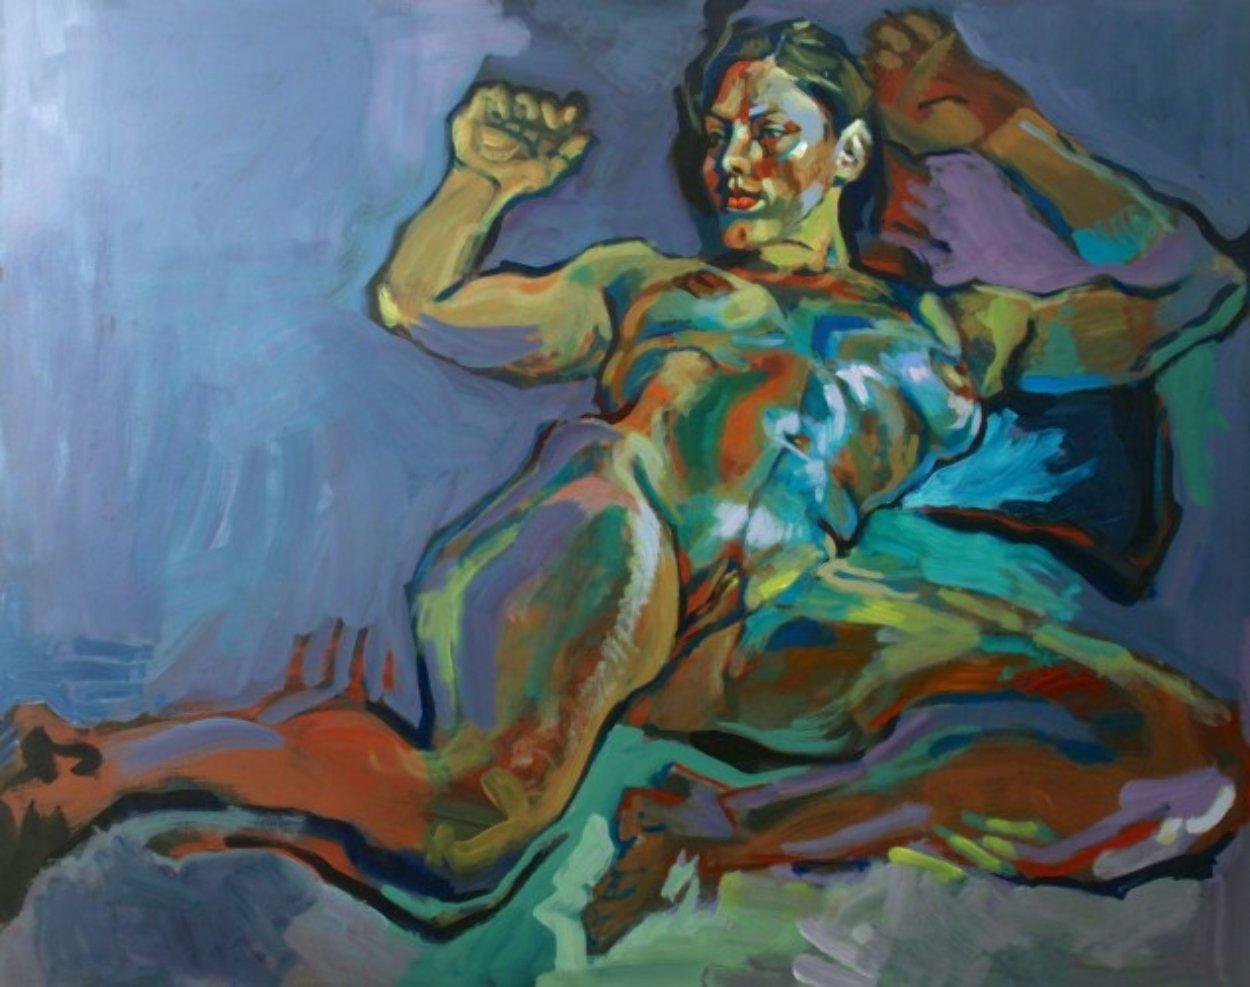 Evening Nude 2012 32x40 Super Huge Original Painting by Piotr Antonow